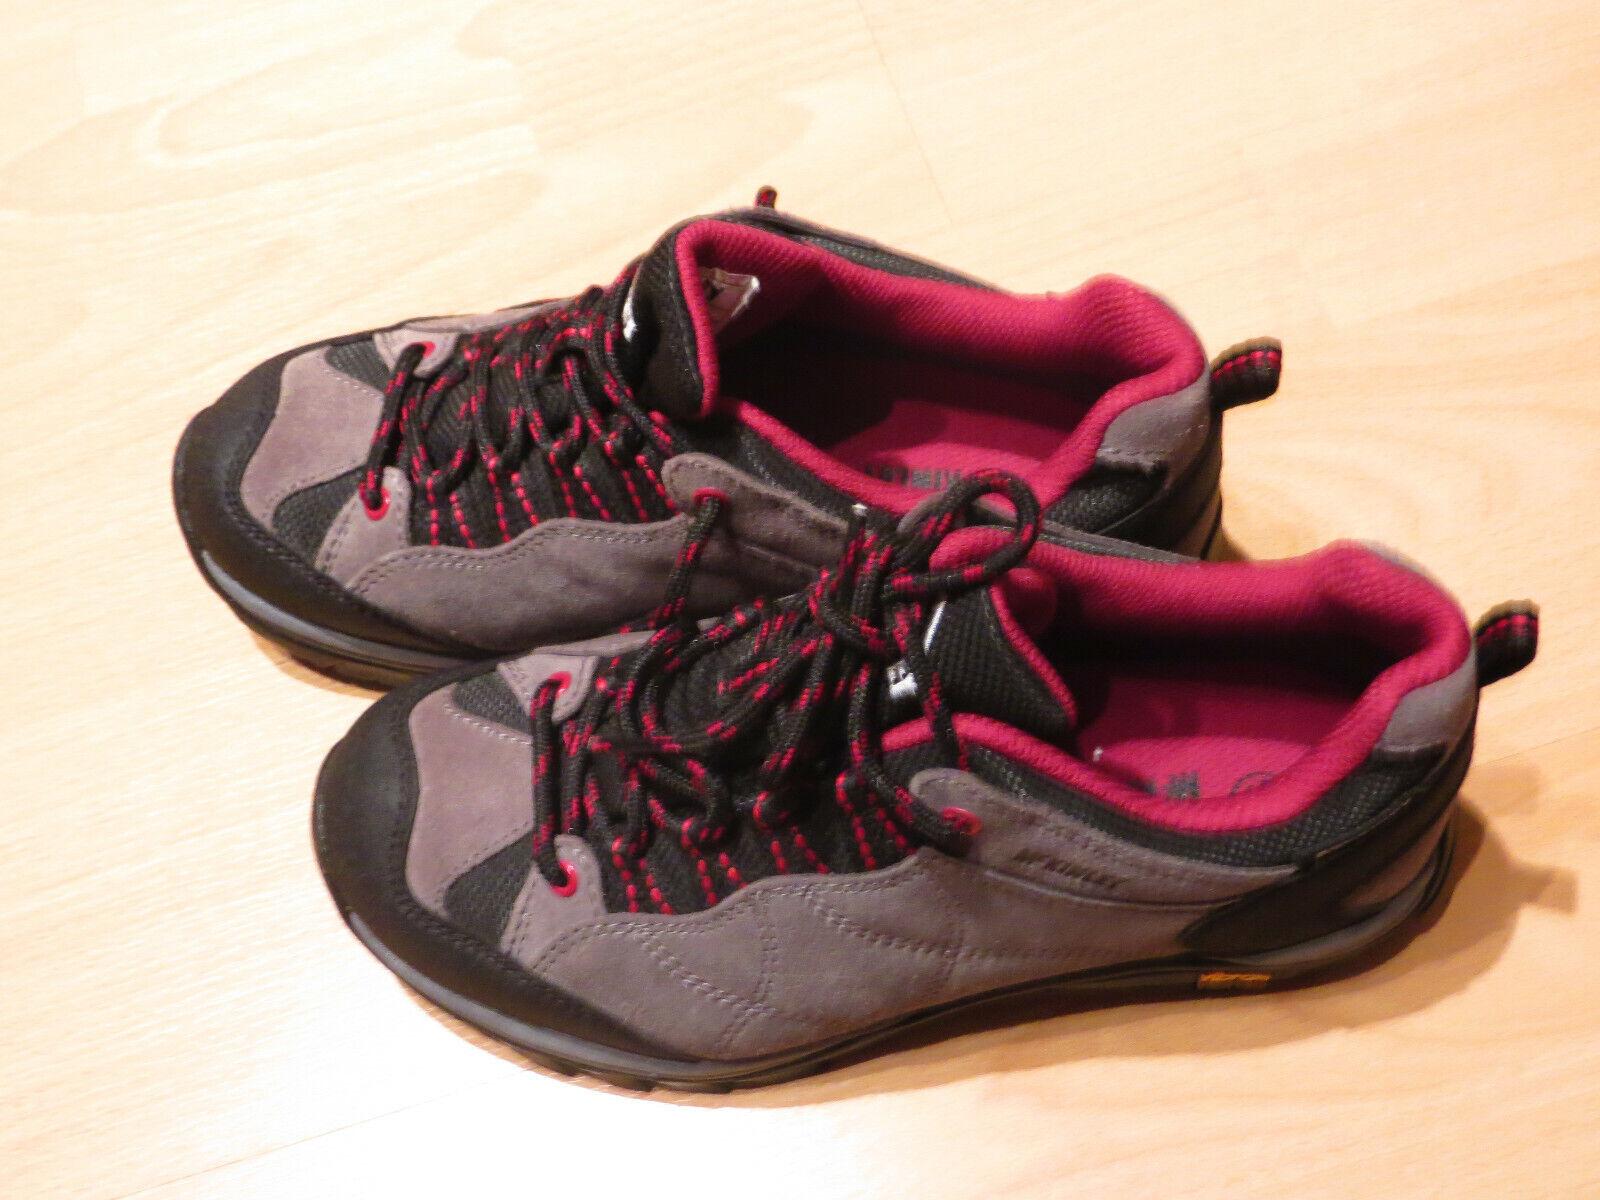 Mc Kinley AQUAMAX Damen Trekking Low Boots Wanderschuhe Gr. 36